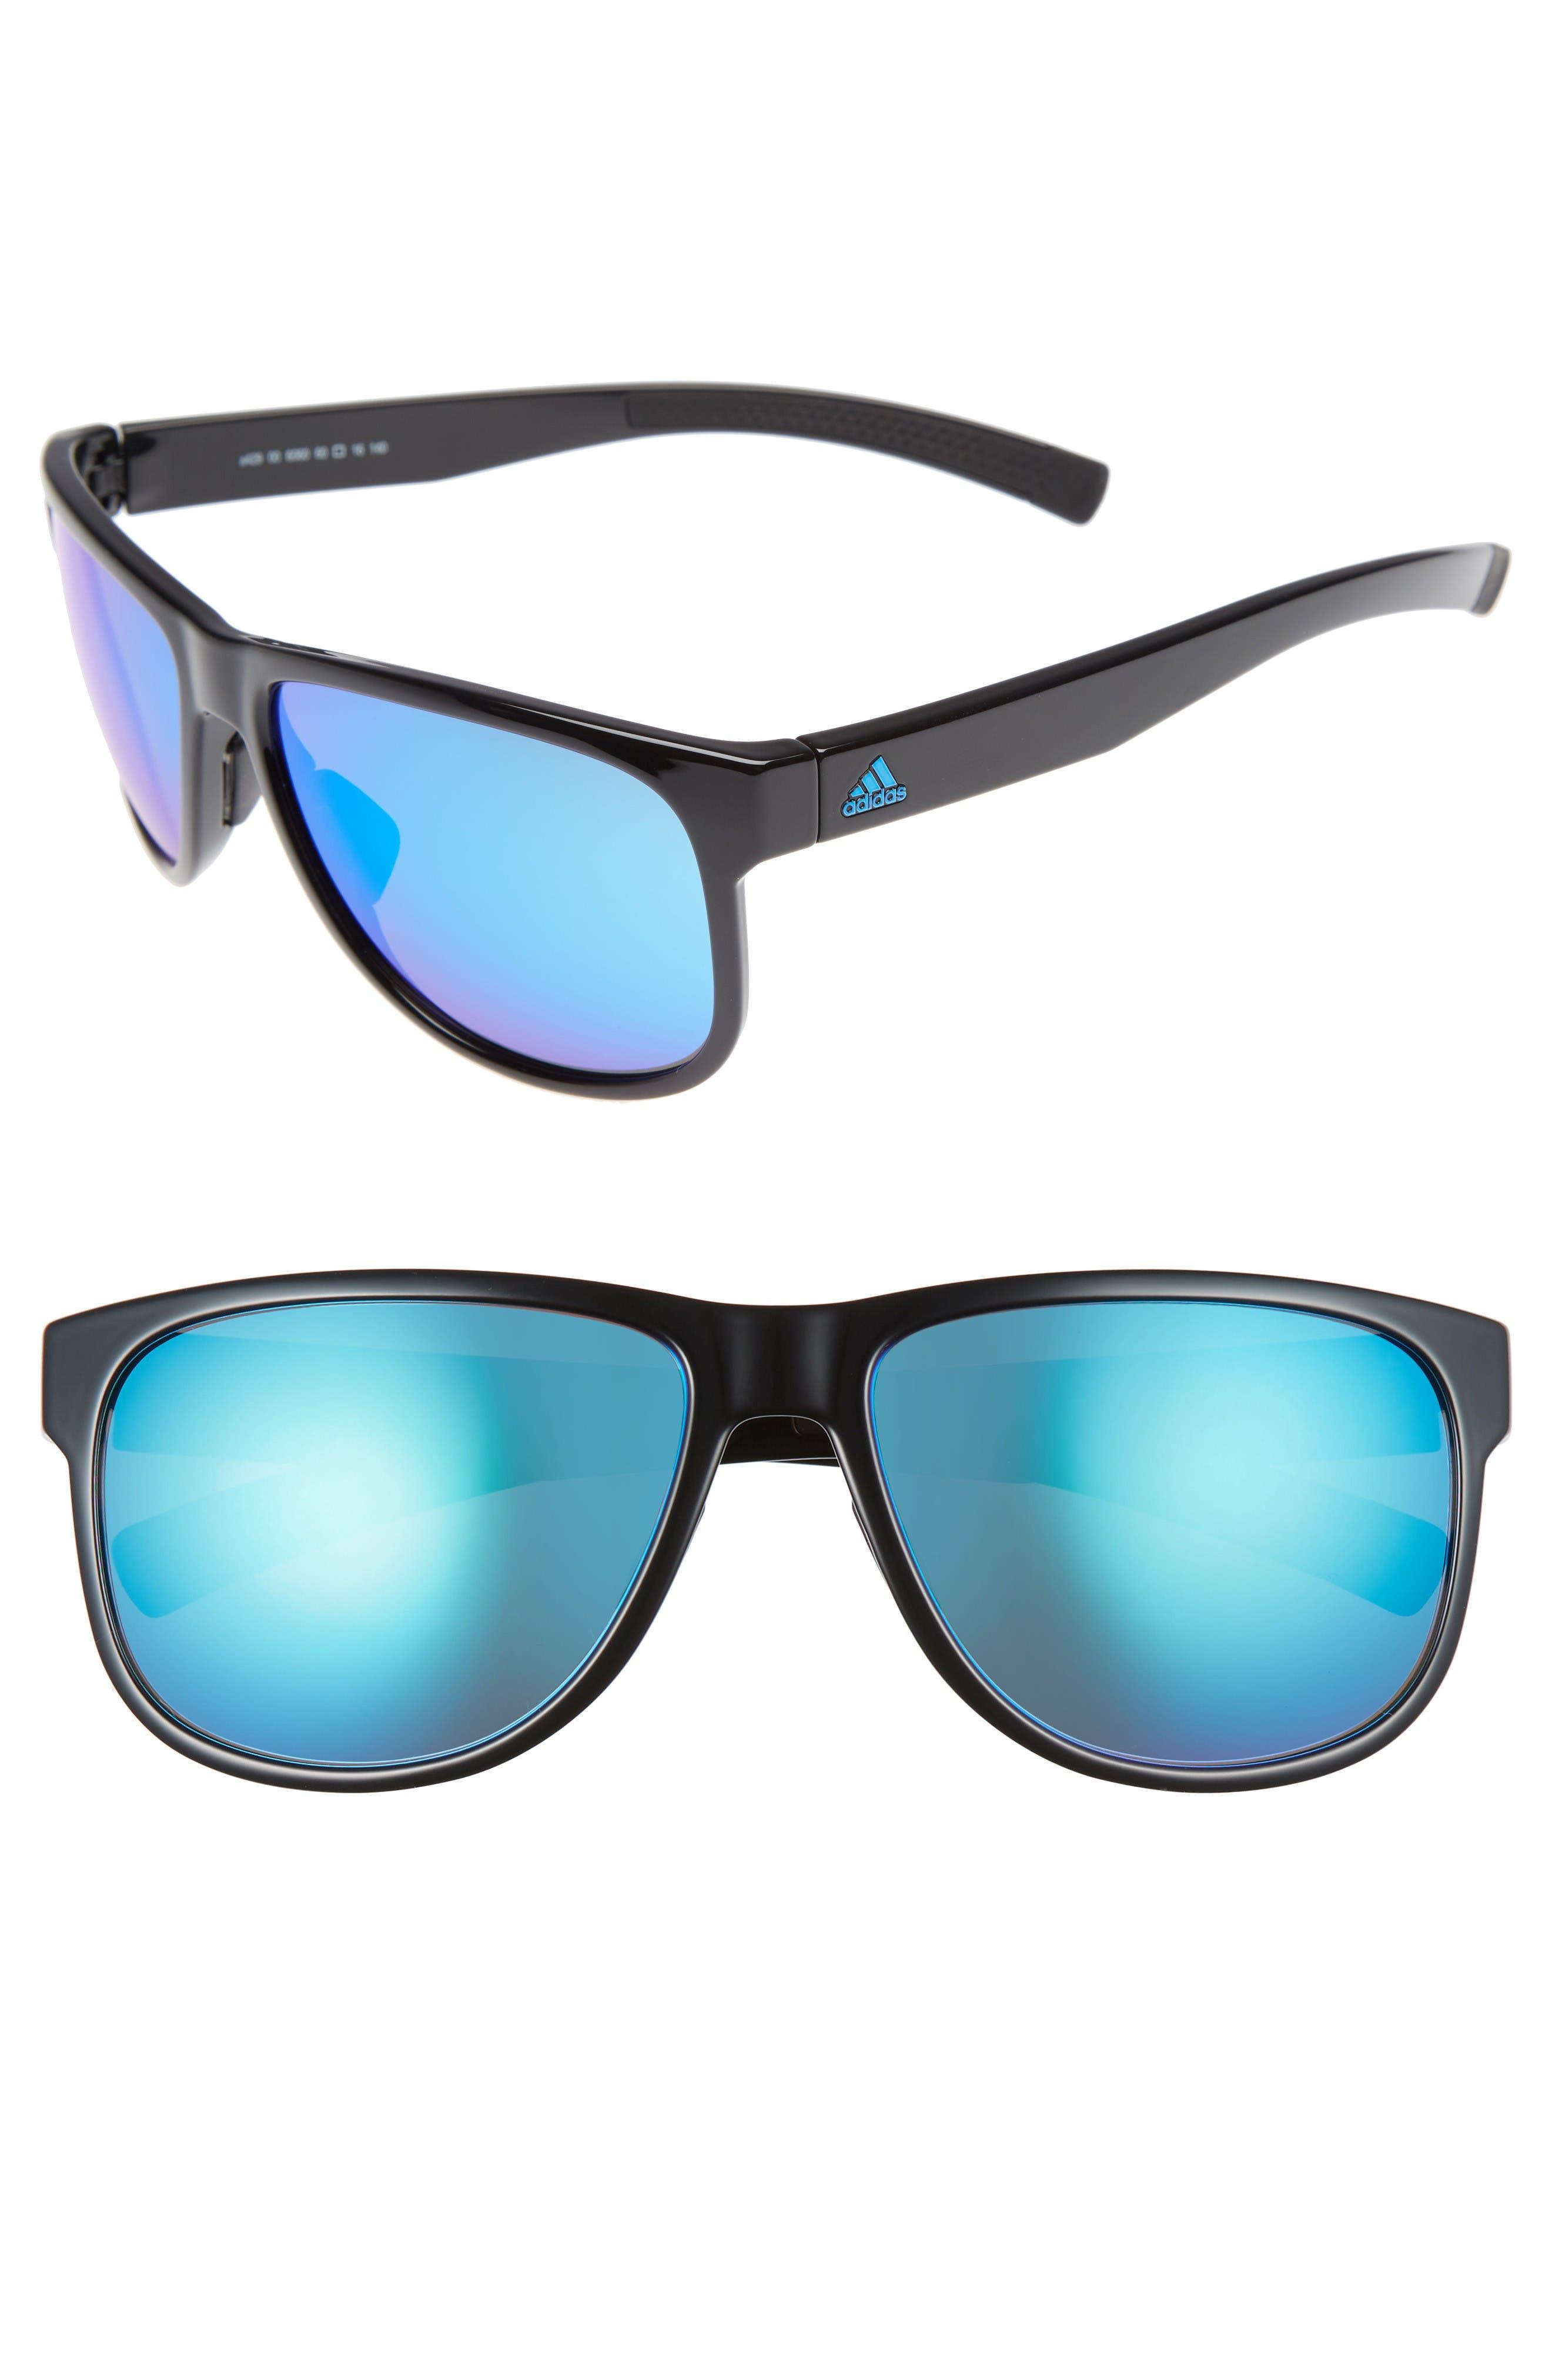 Main Image - adidas Sprung 60mm Sunglasses